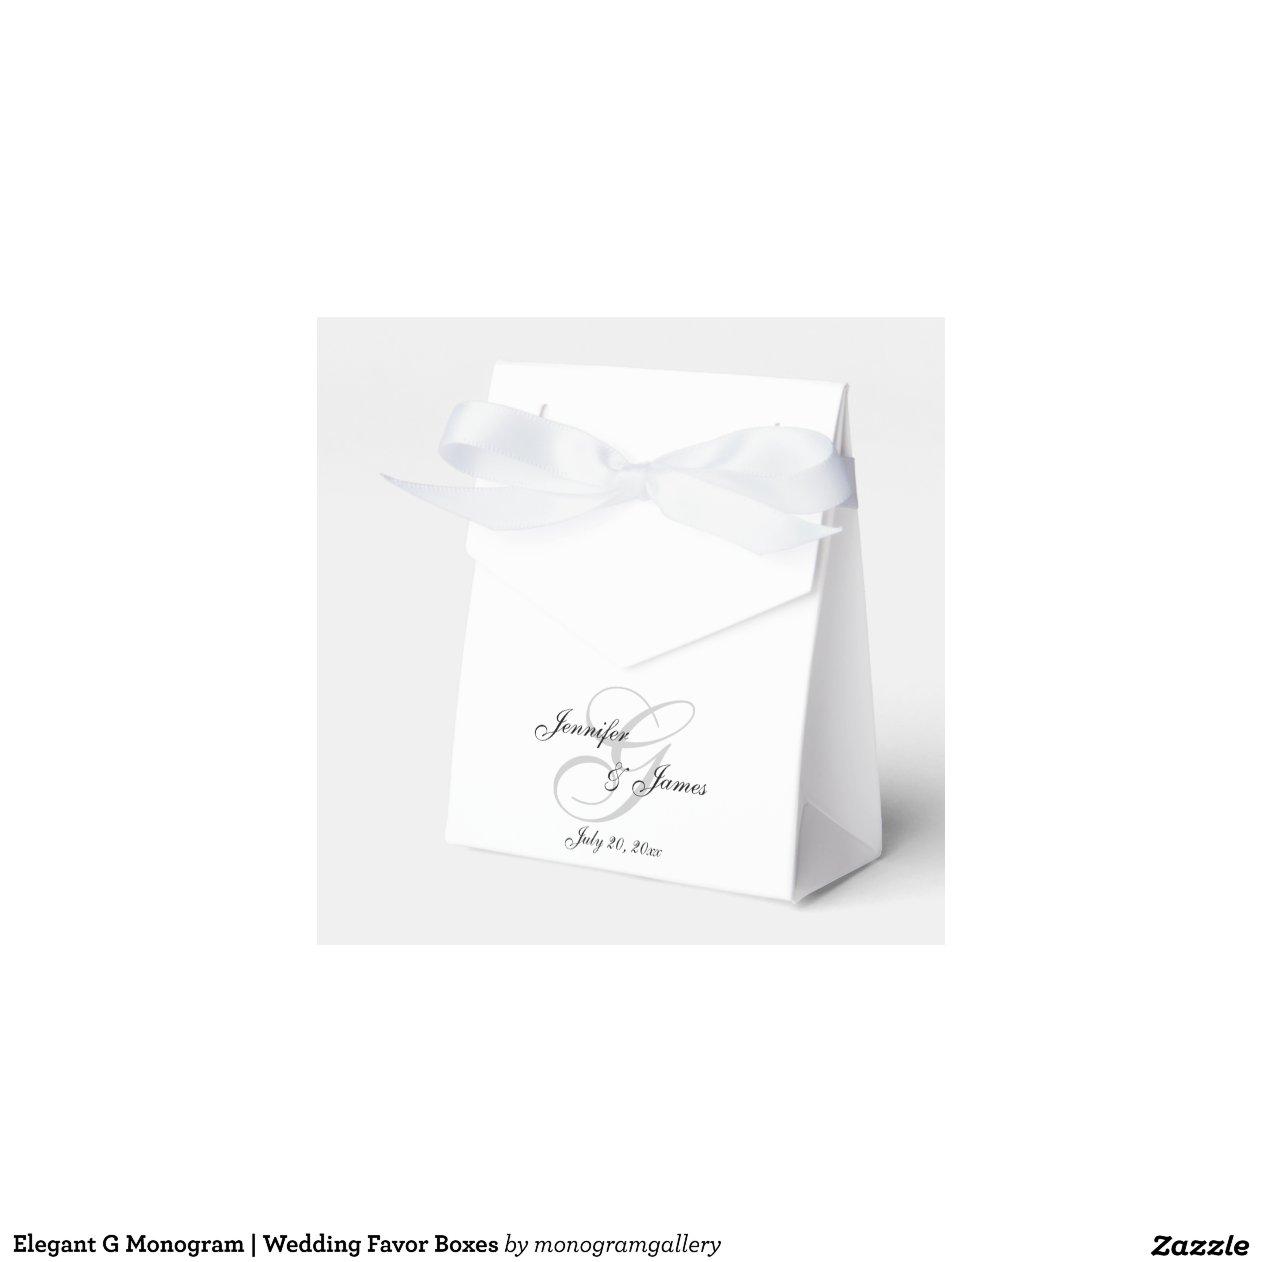 Wedding Favor Boxes Trinidad : Elegant g monogram wedding favor boxes zazzle